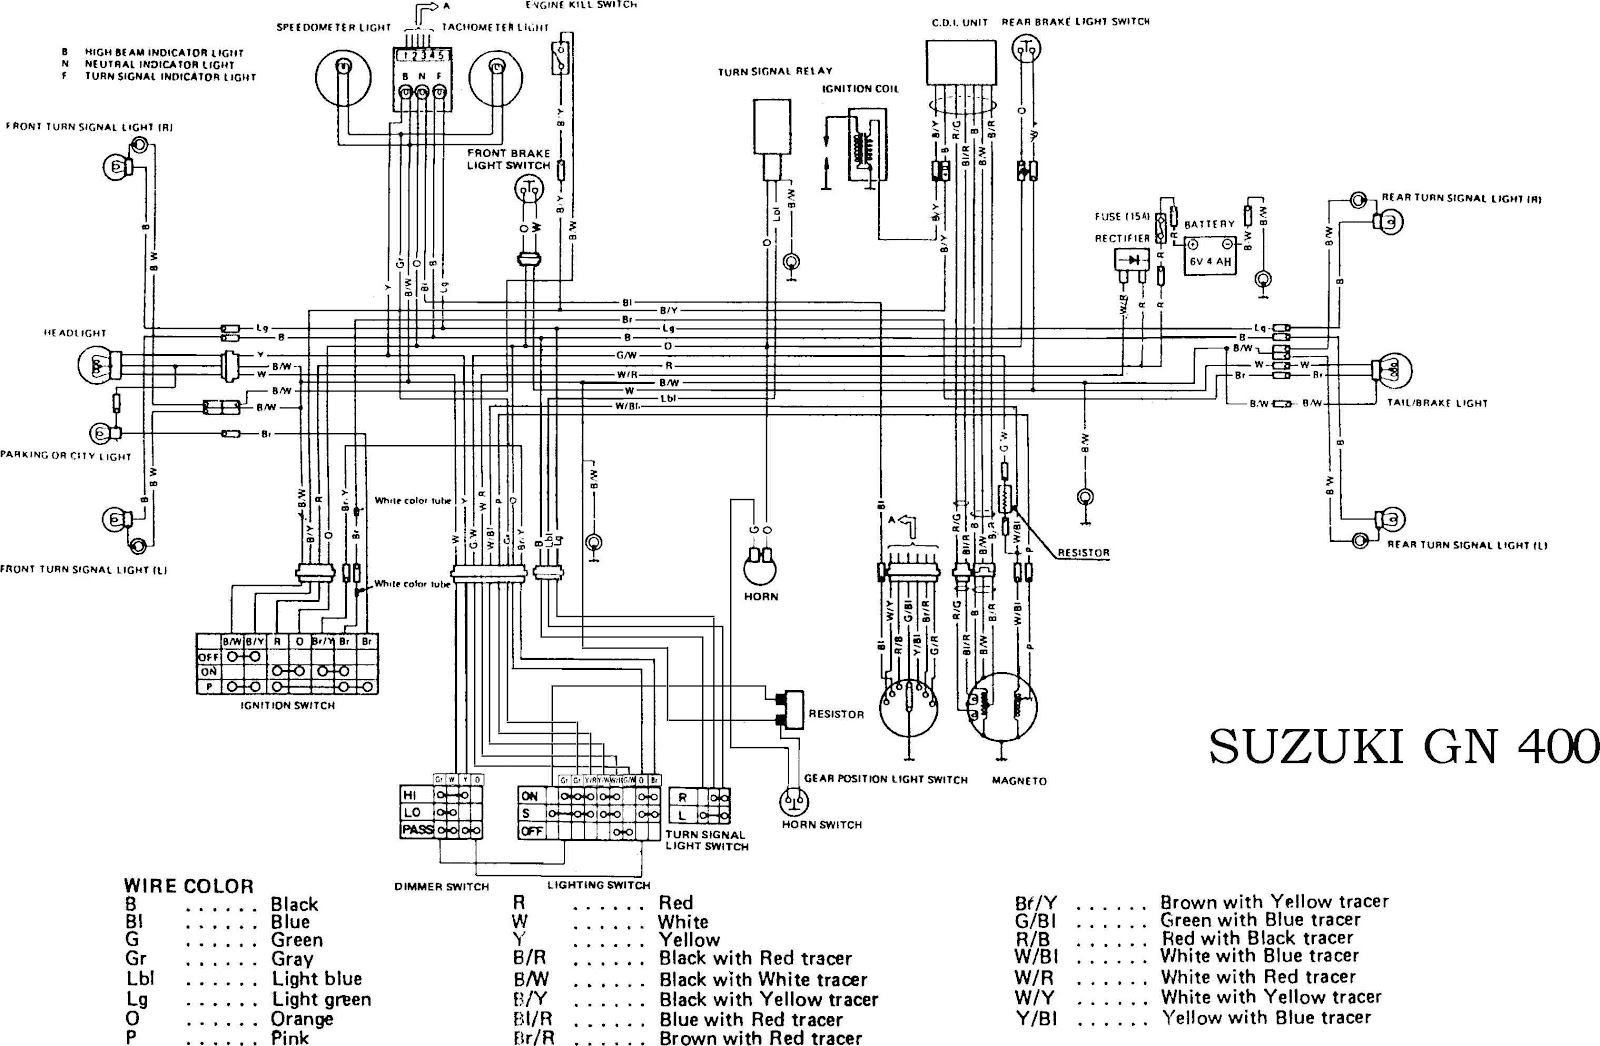 Suzuki GSXR600 SRAD motorcycle 1998 Complete Electrical